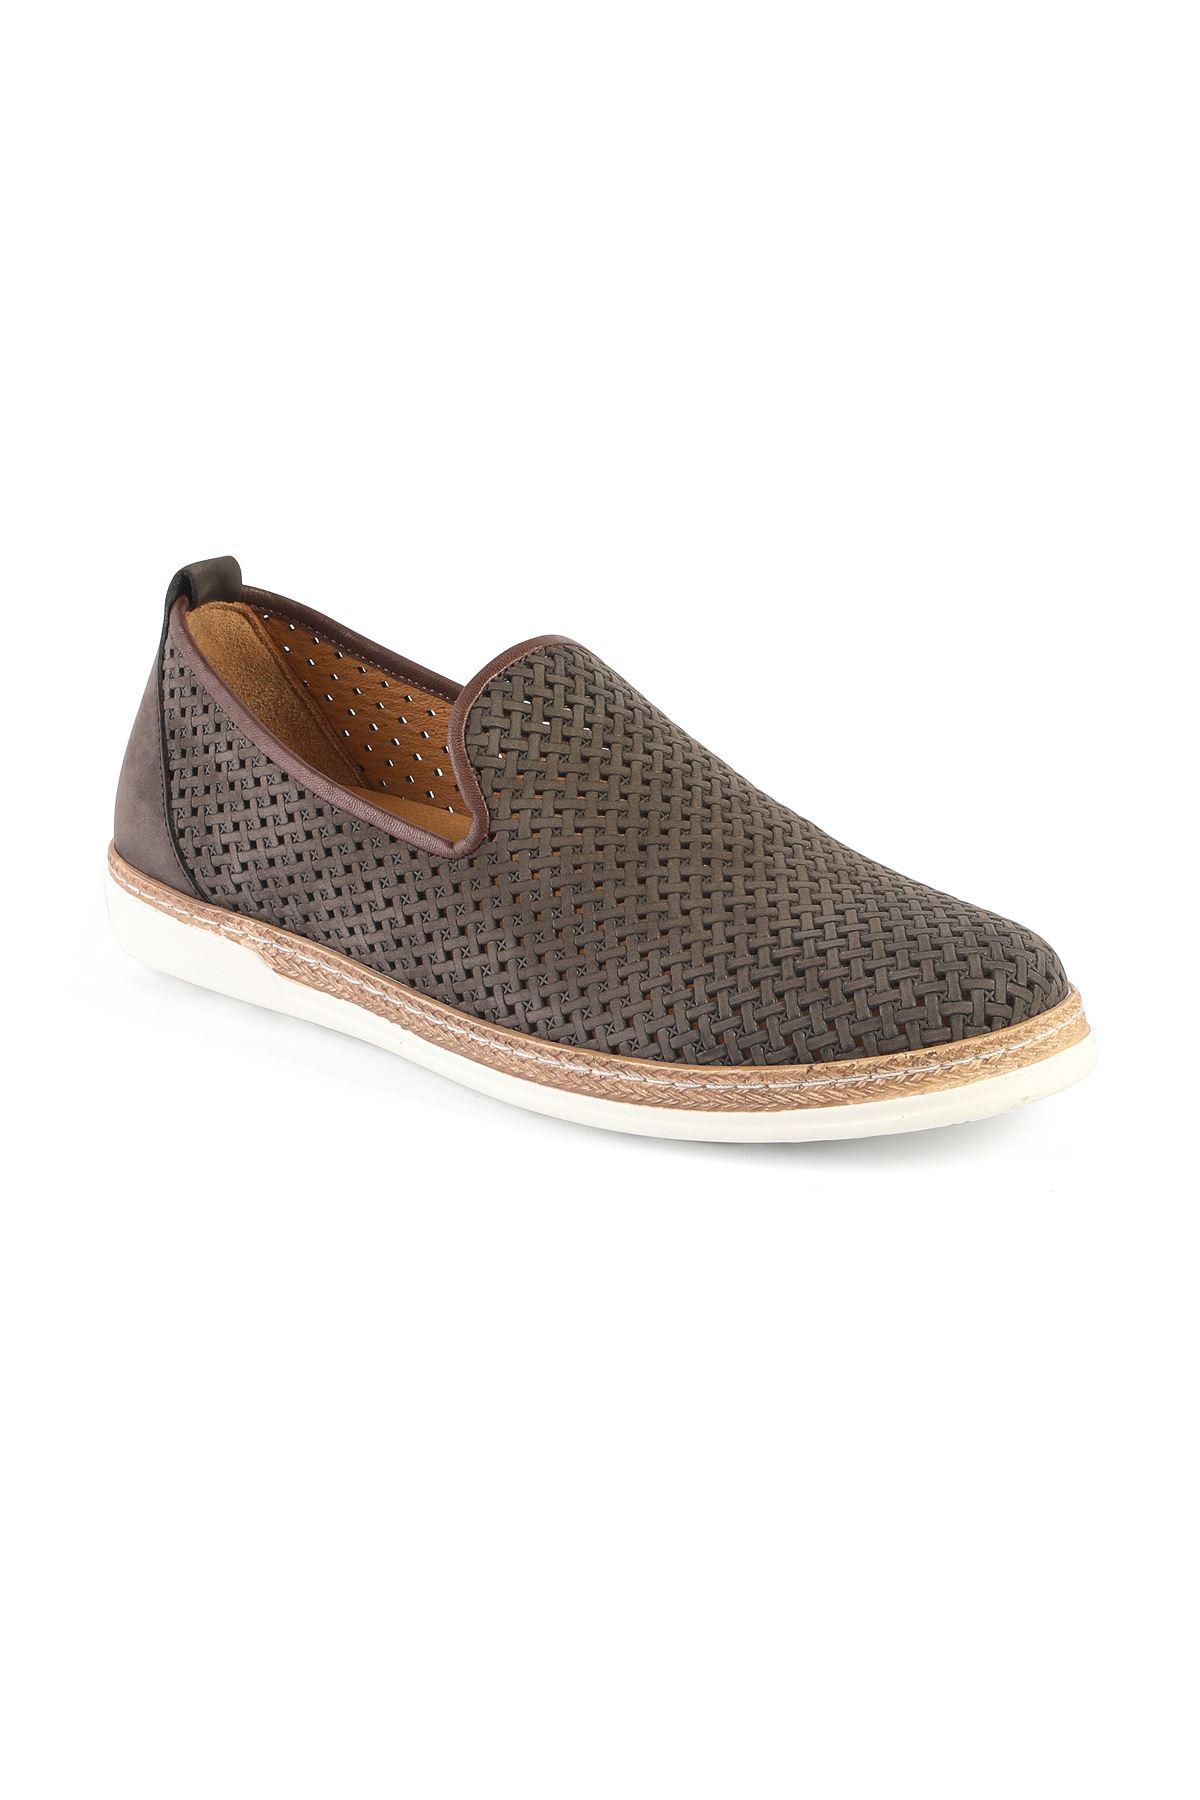 Libero 3397 Kahve Loafer Ayakkabı